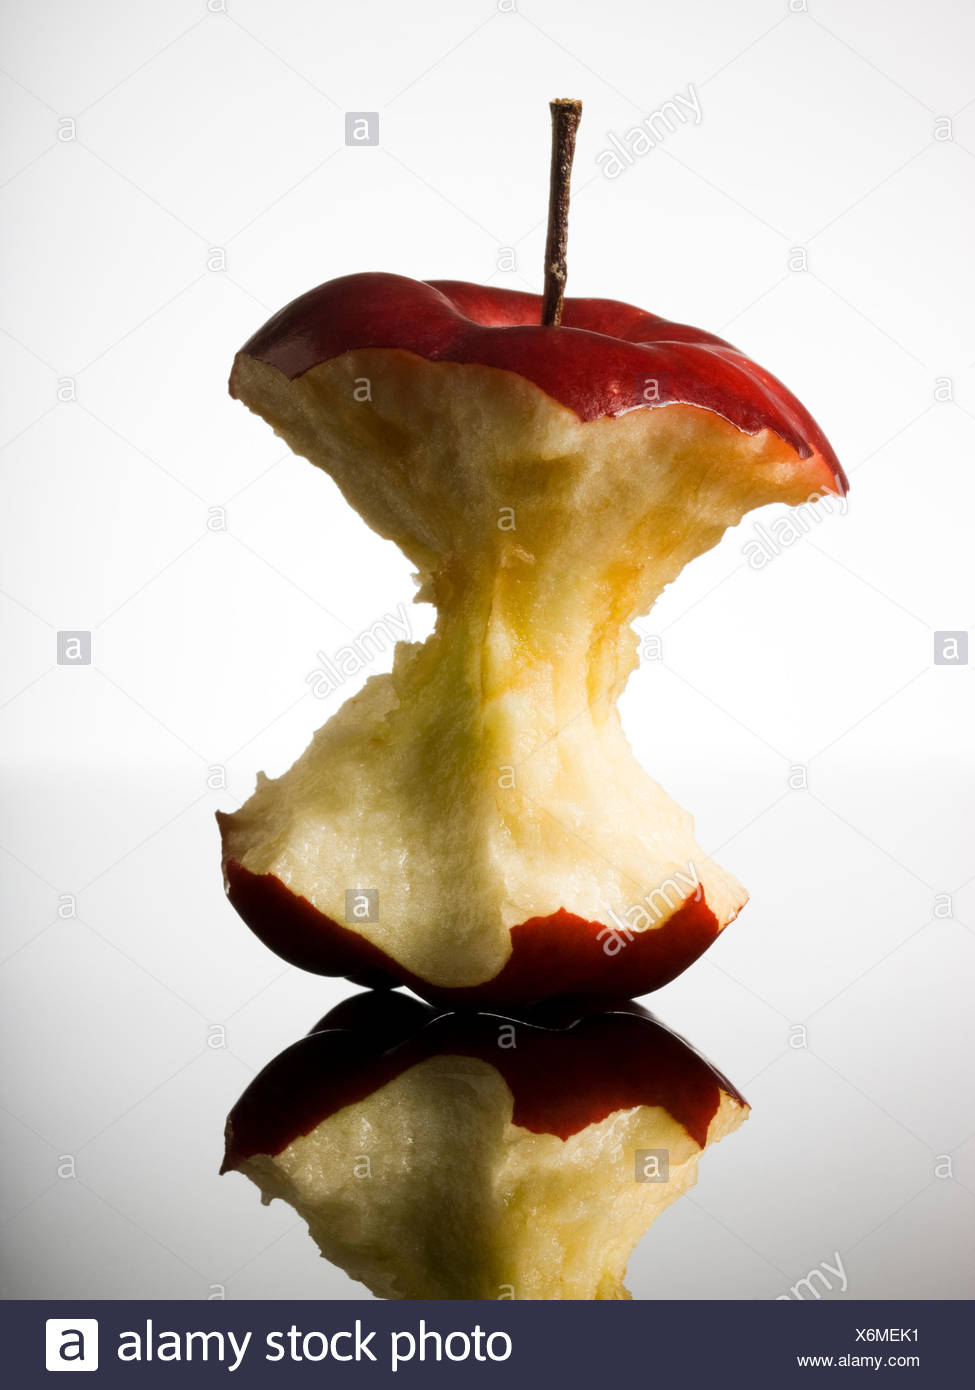 apple core - Stock Image